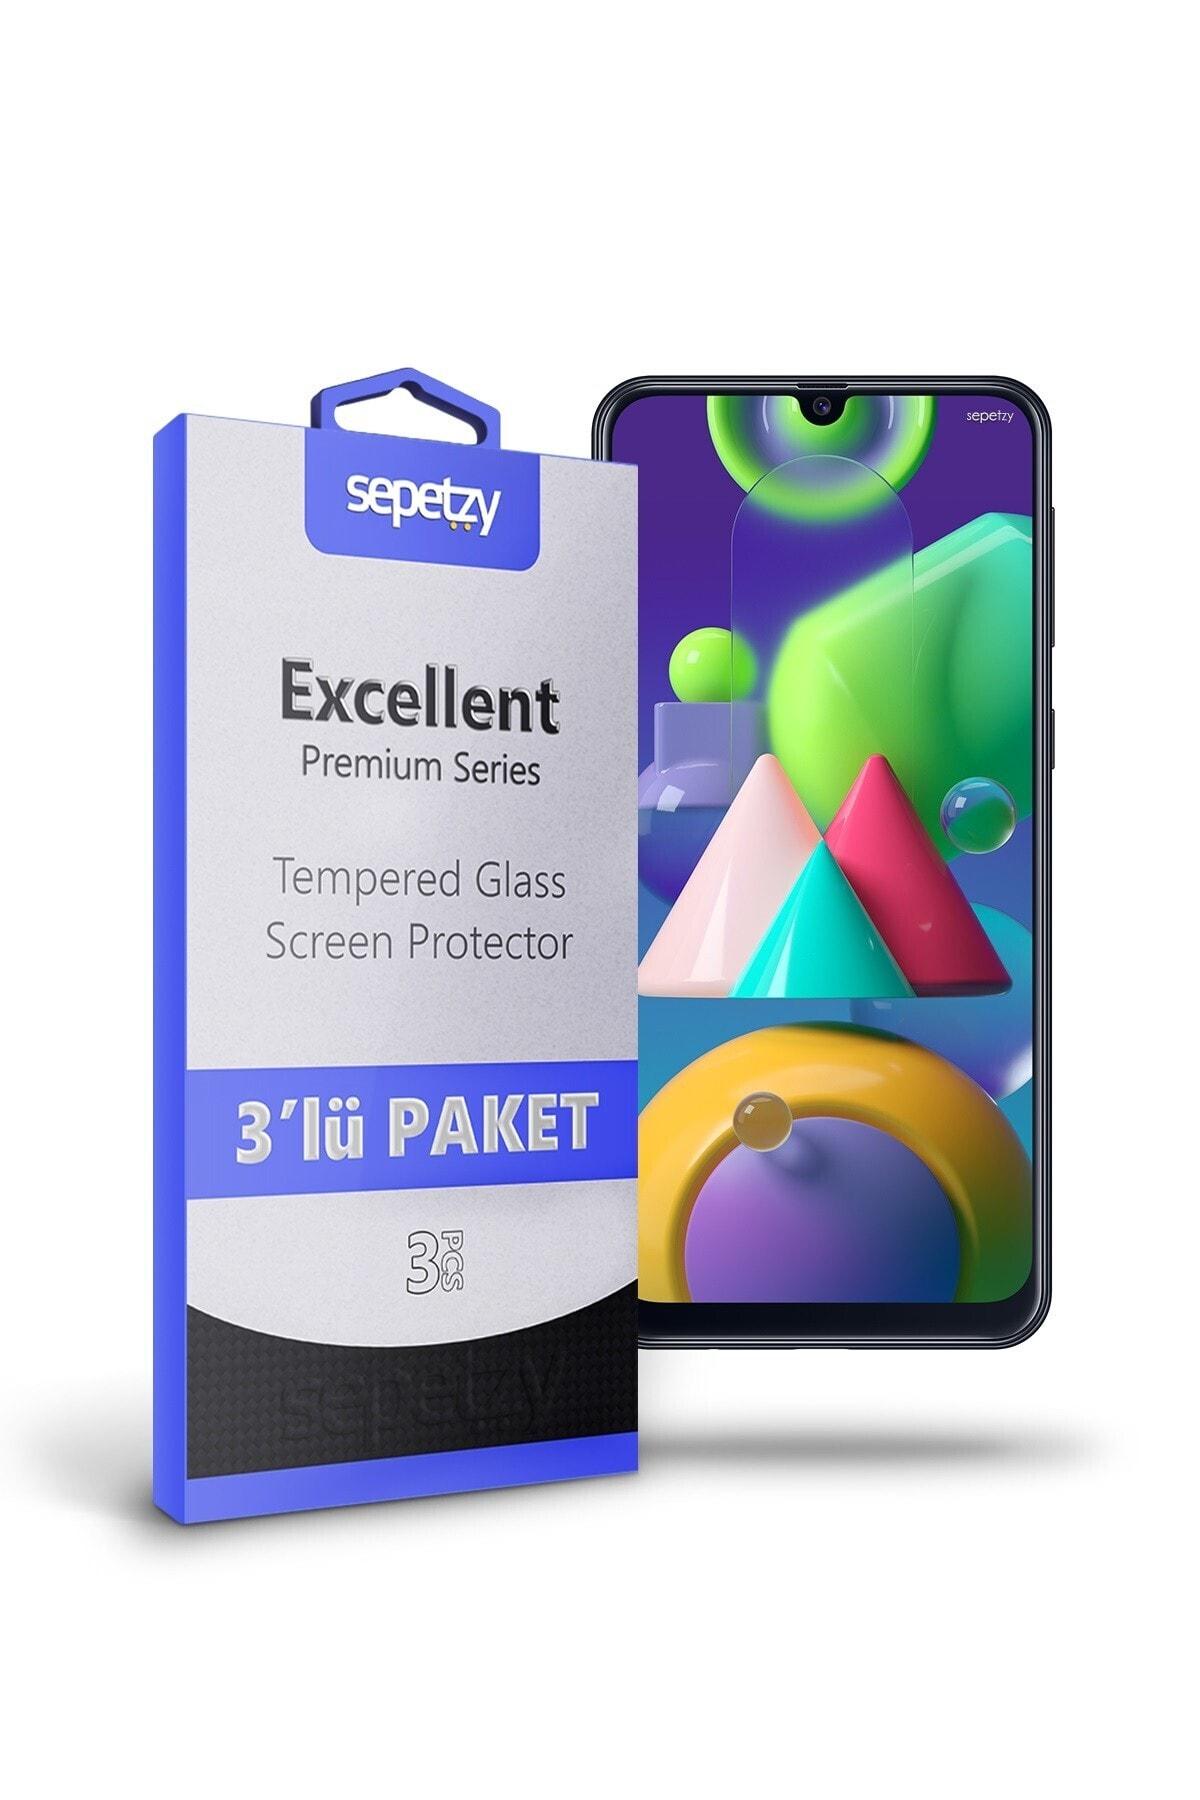 sepetzy Samsung Galaxy M21 Temperli Kırılmaz Cam Ekran Koruyucu 3'lü Paket 1